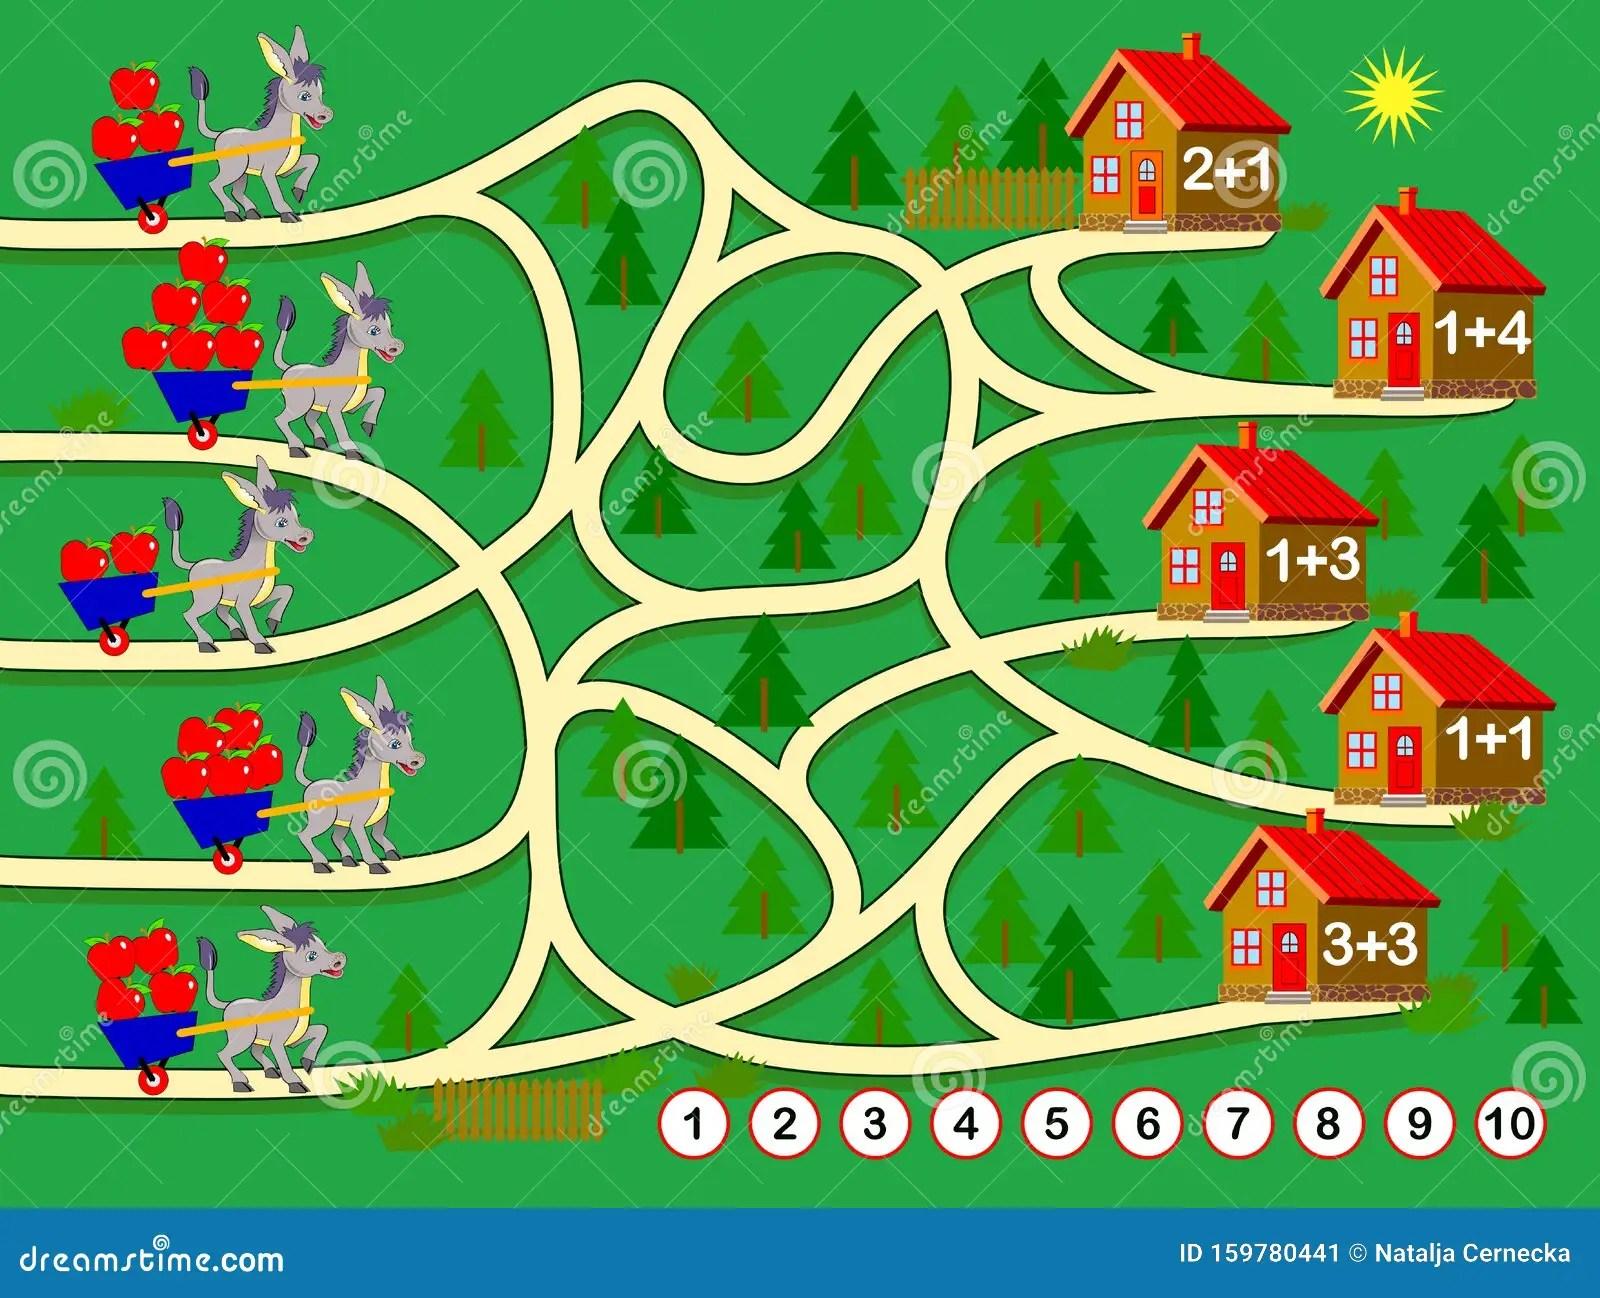 Logic Puzzle Game For Children Worksheet For Math